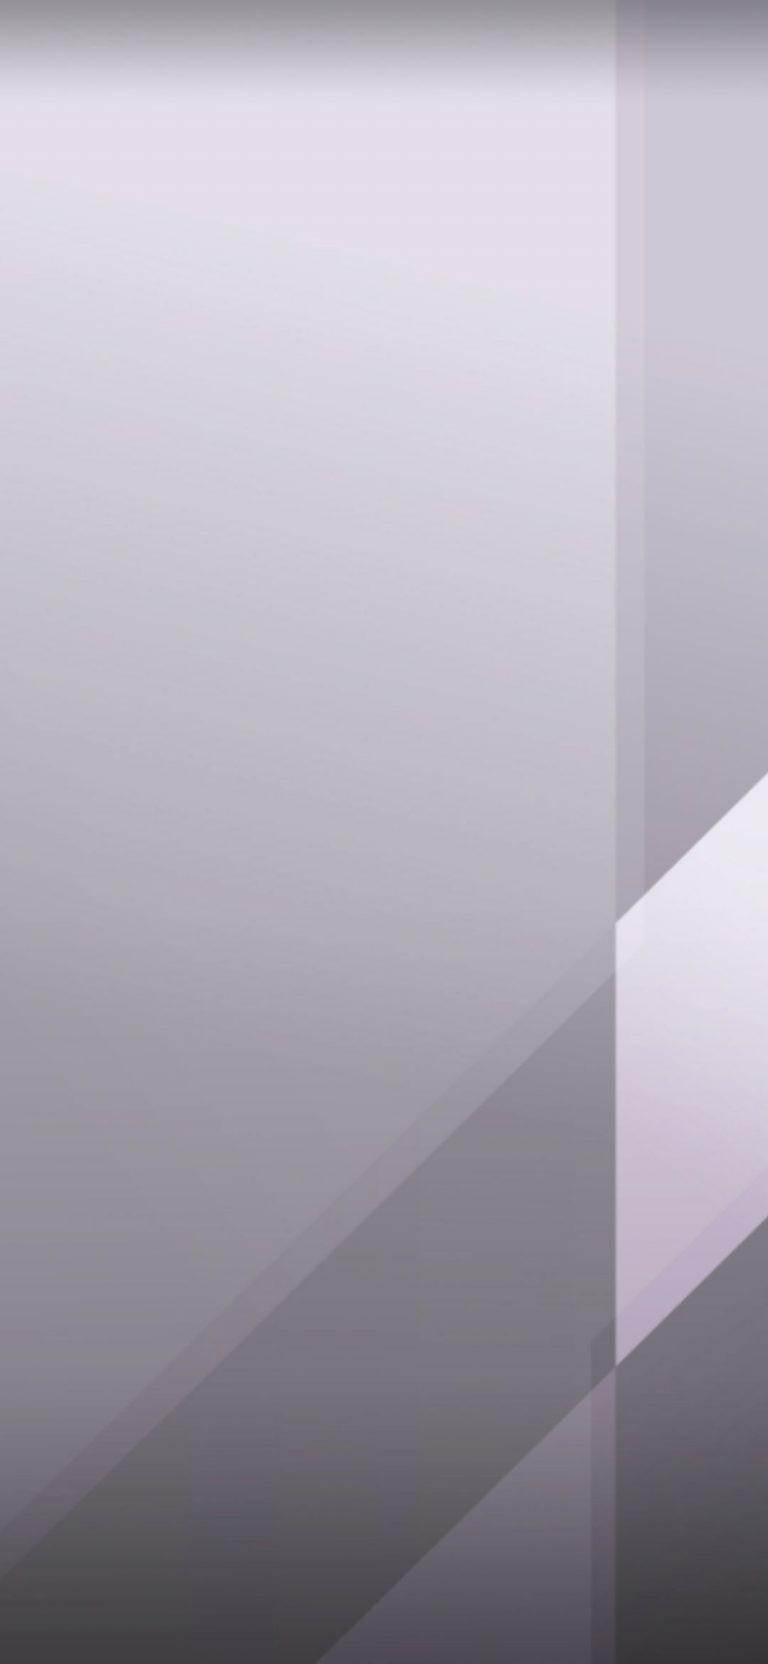 Honor X10 Stock Wallpaper [1080x2340] - 04